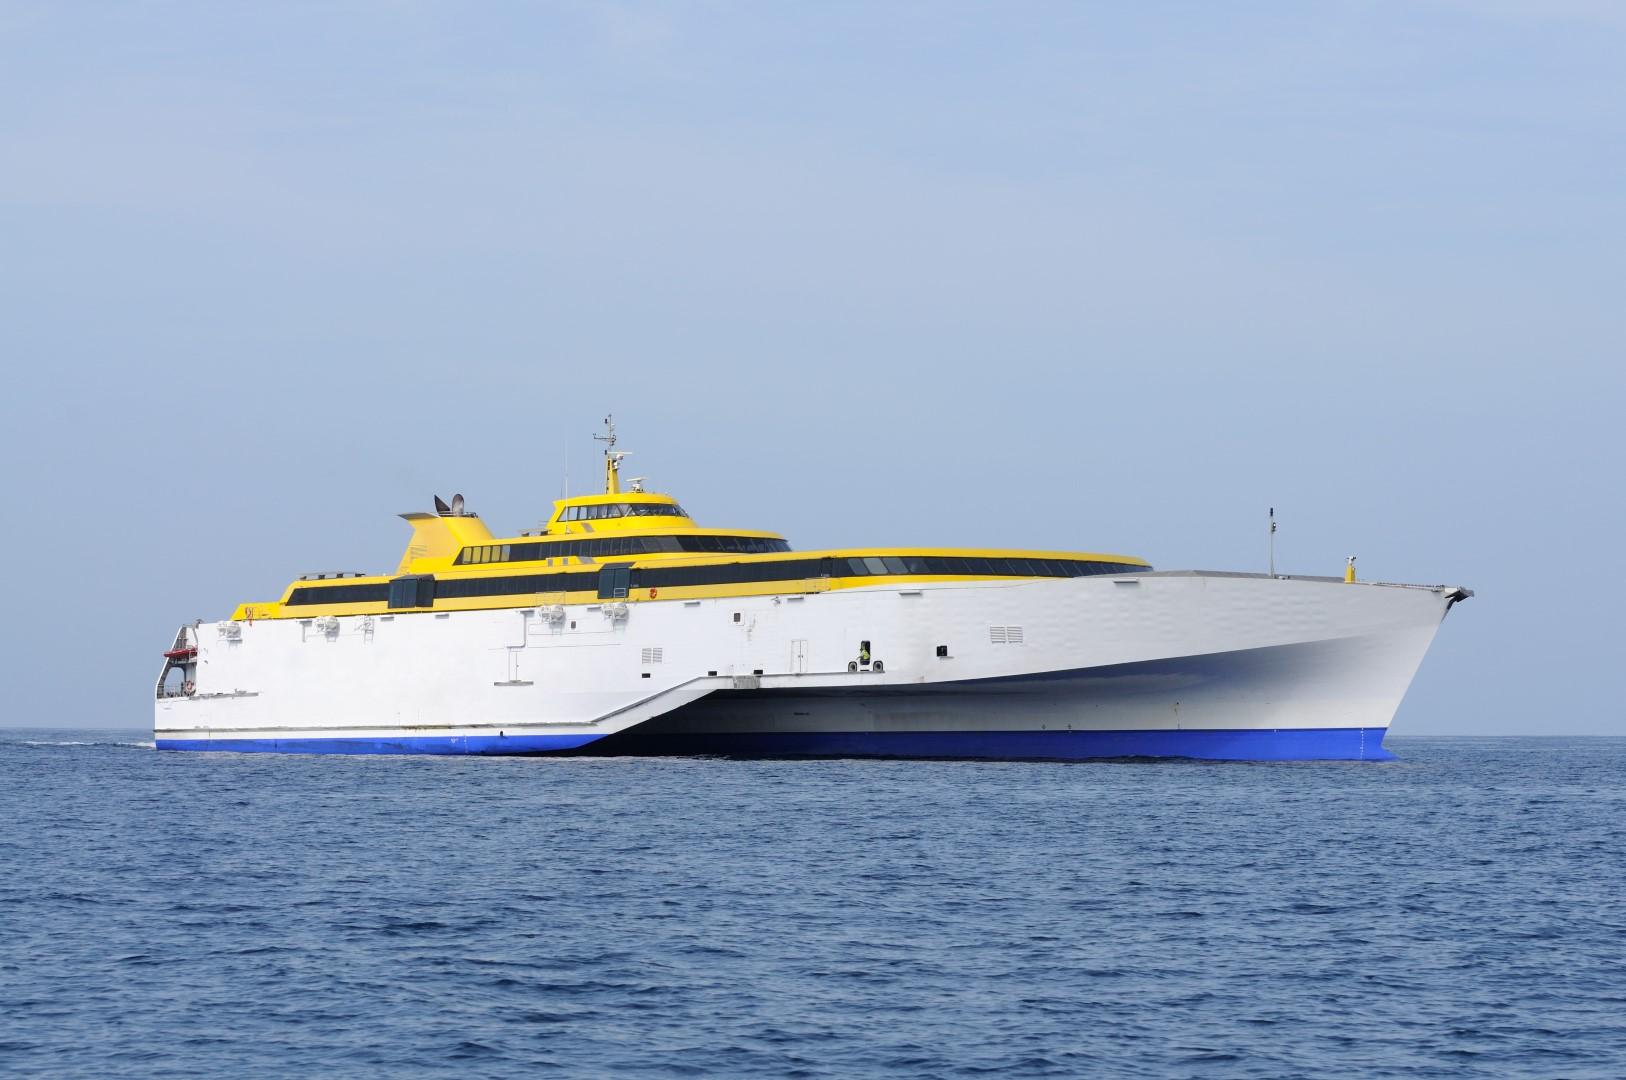 high-speed-ferry-Large.jpg